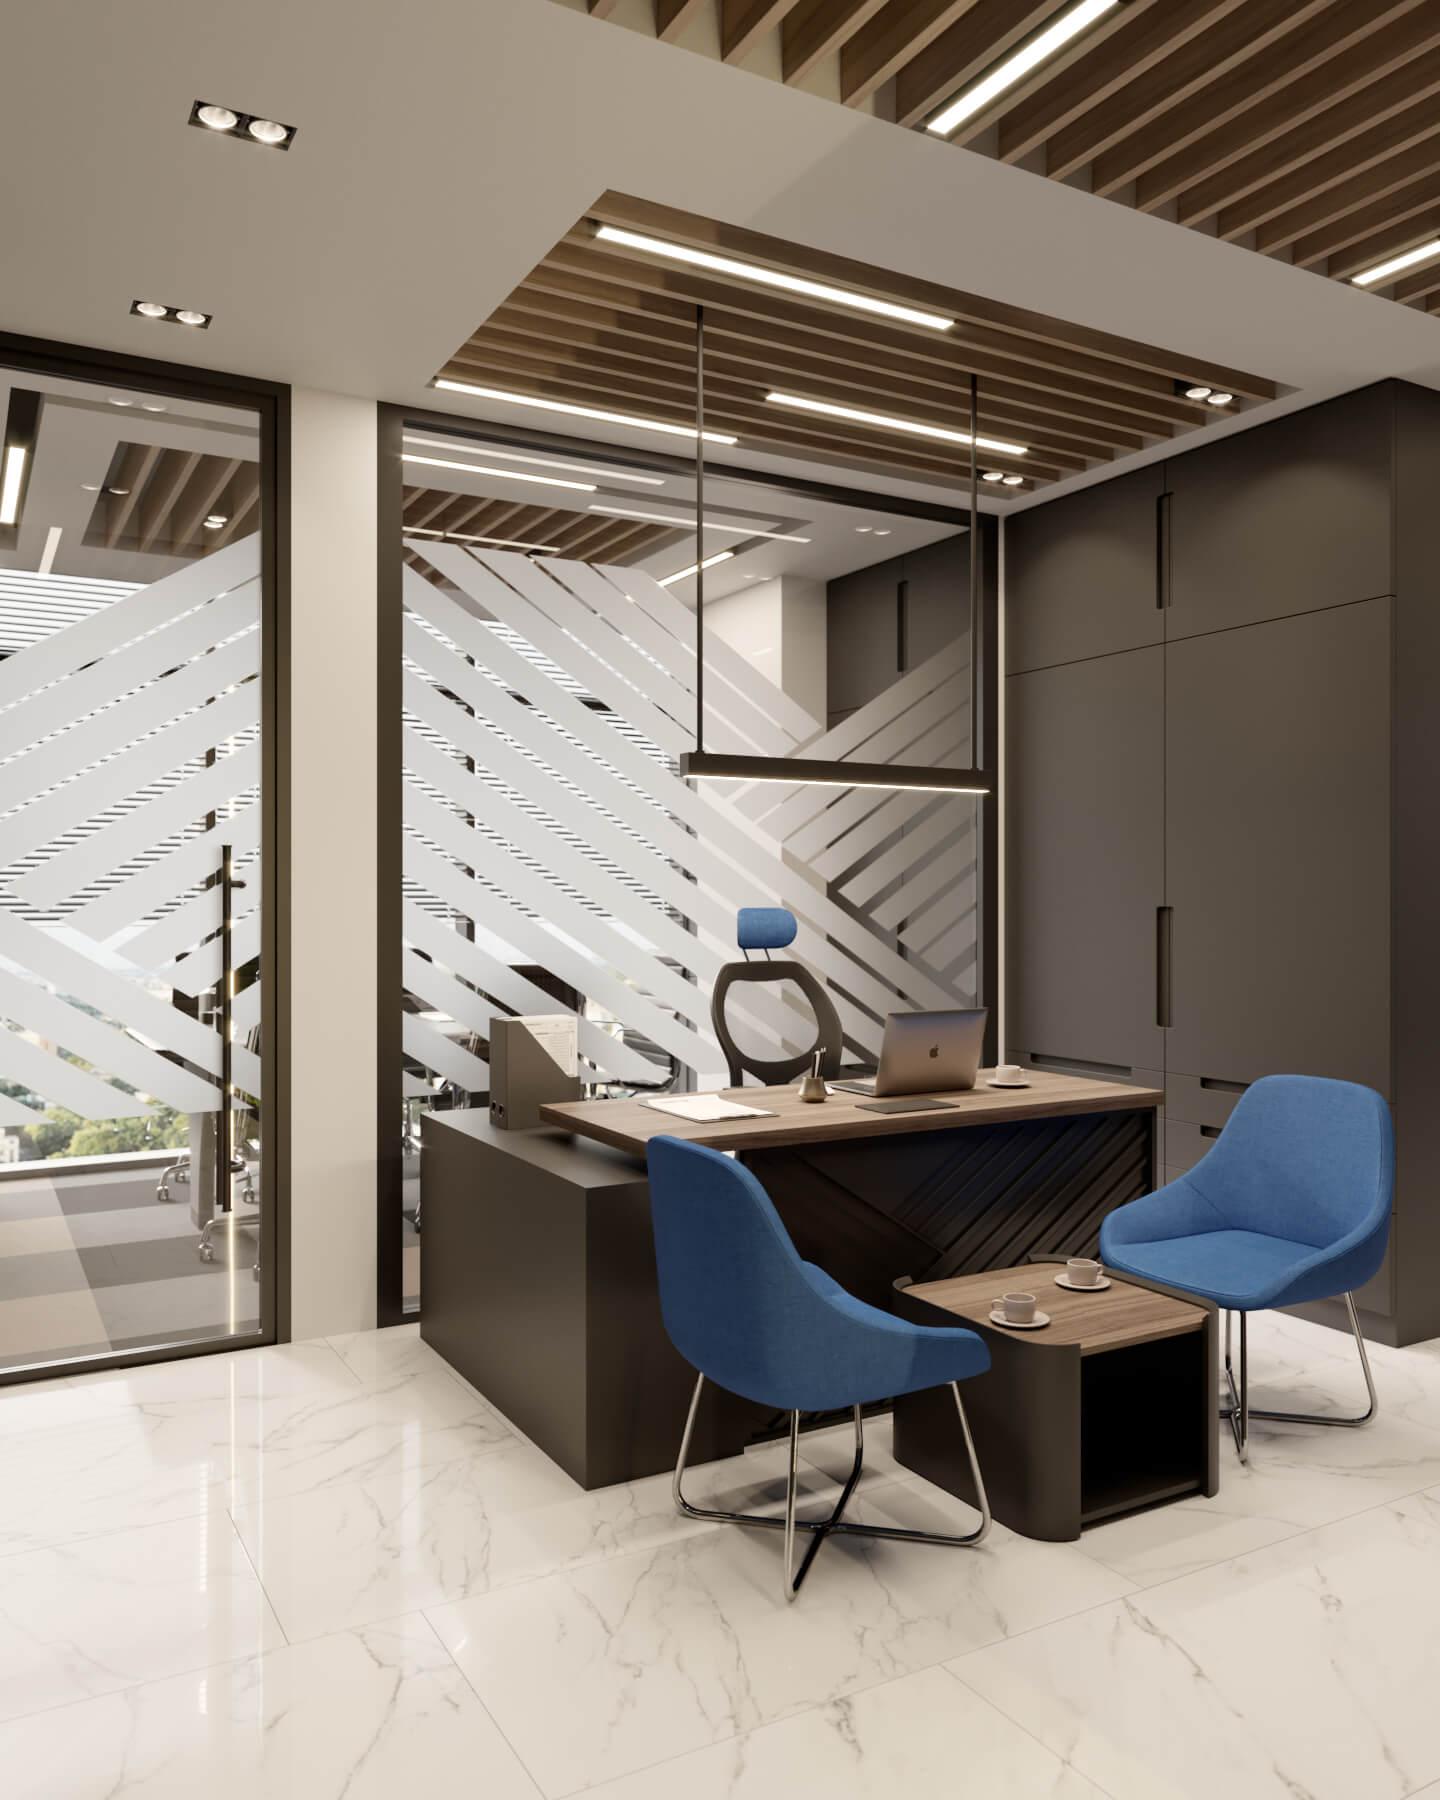 ofis içmimari 4107 Altın Hayat Sigorta Ofisler